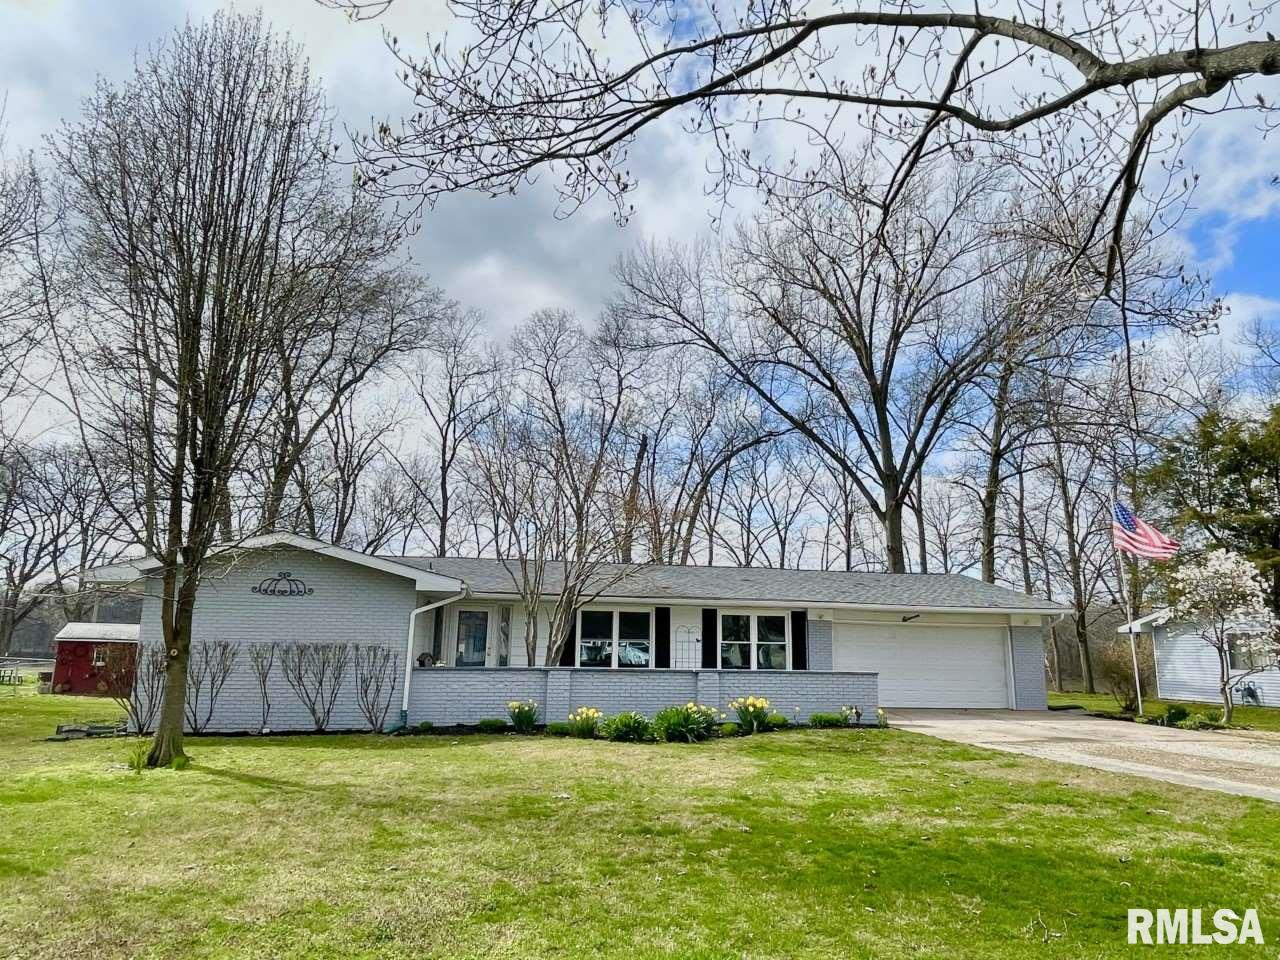 11 MONROE Property Photo - Salem, IL real estate listing